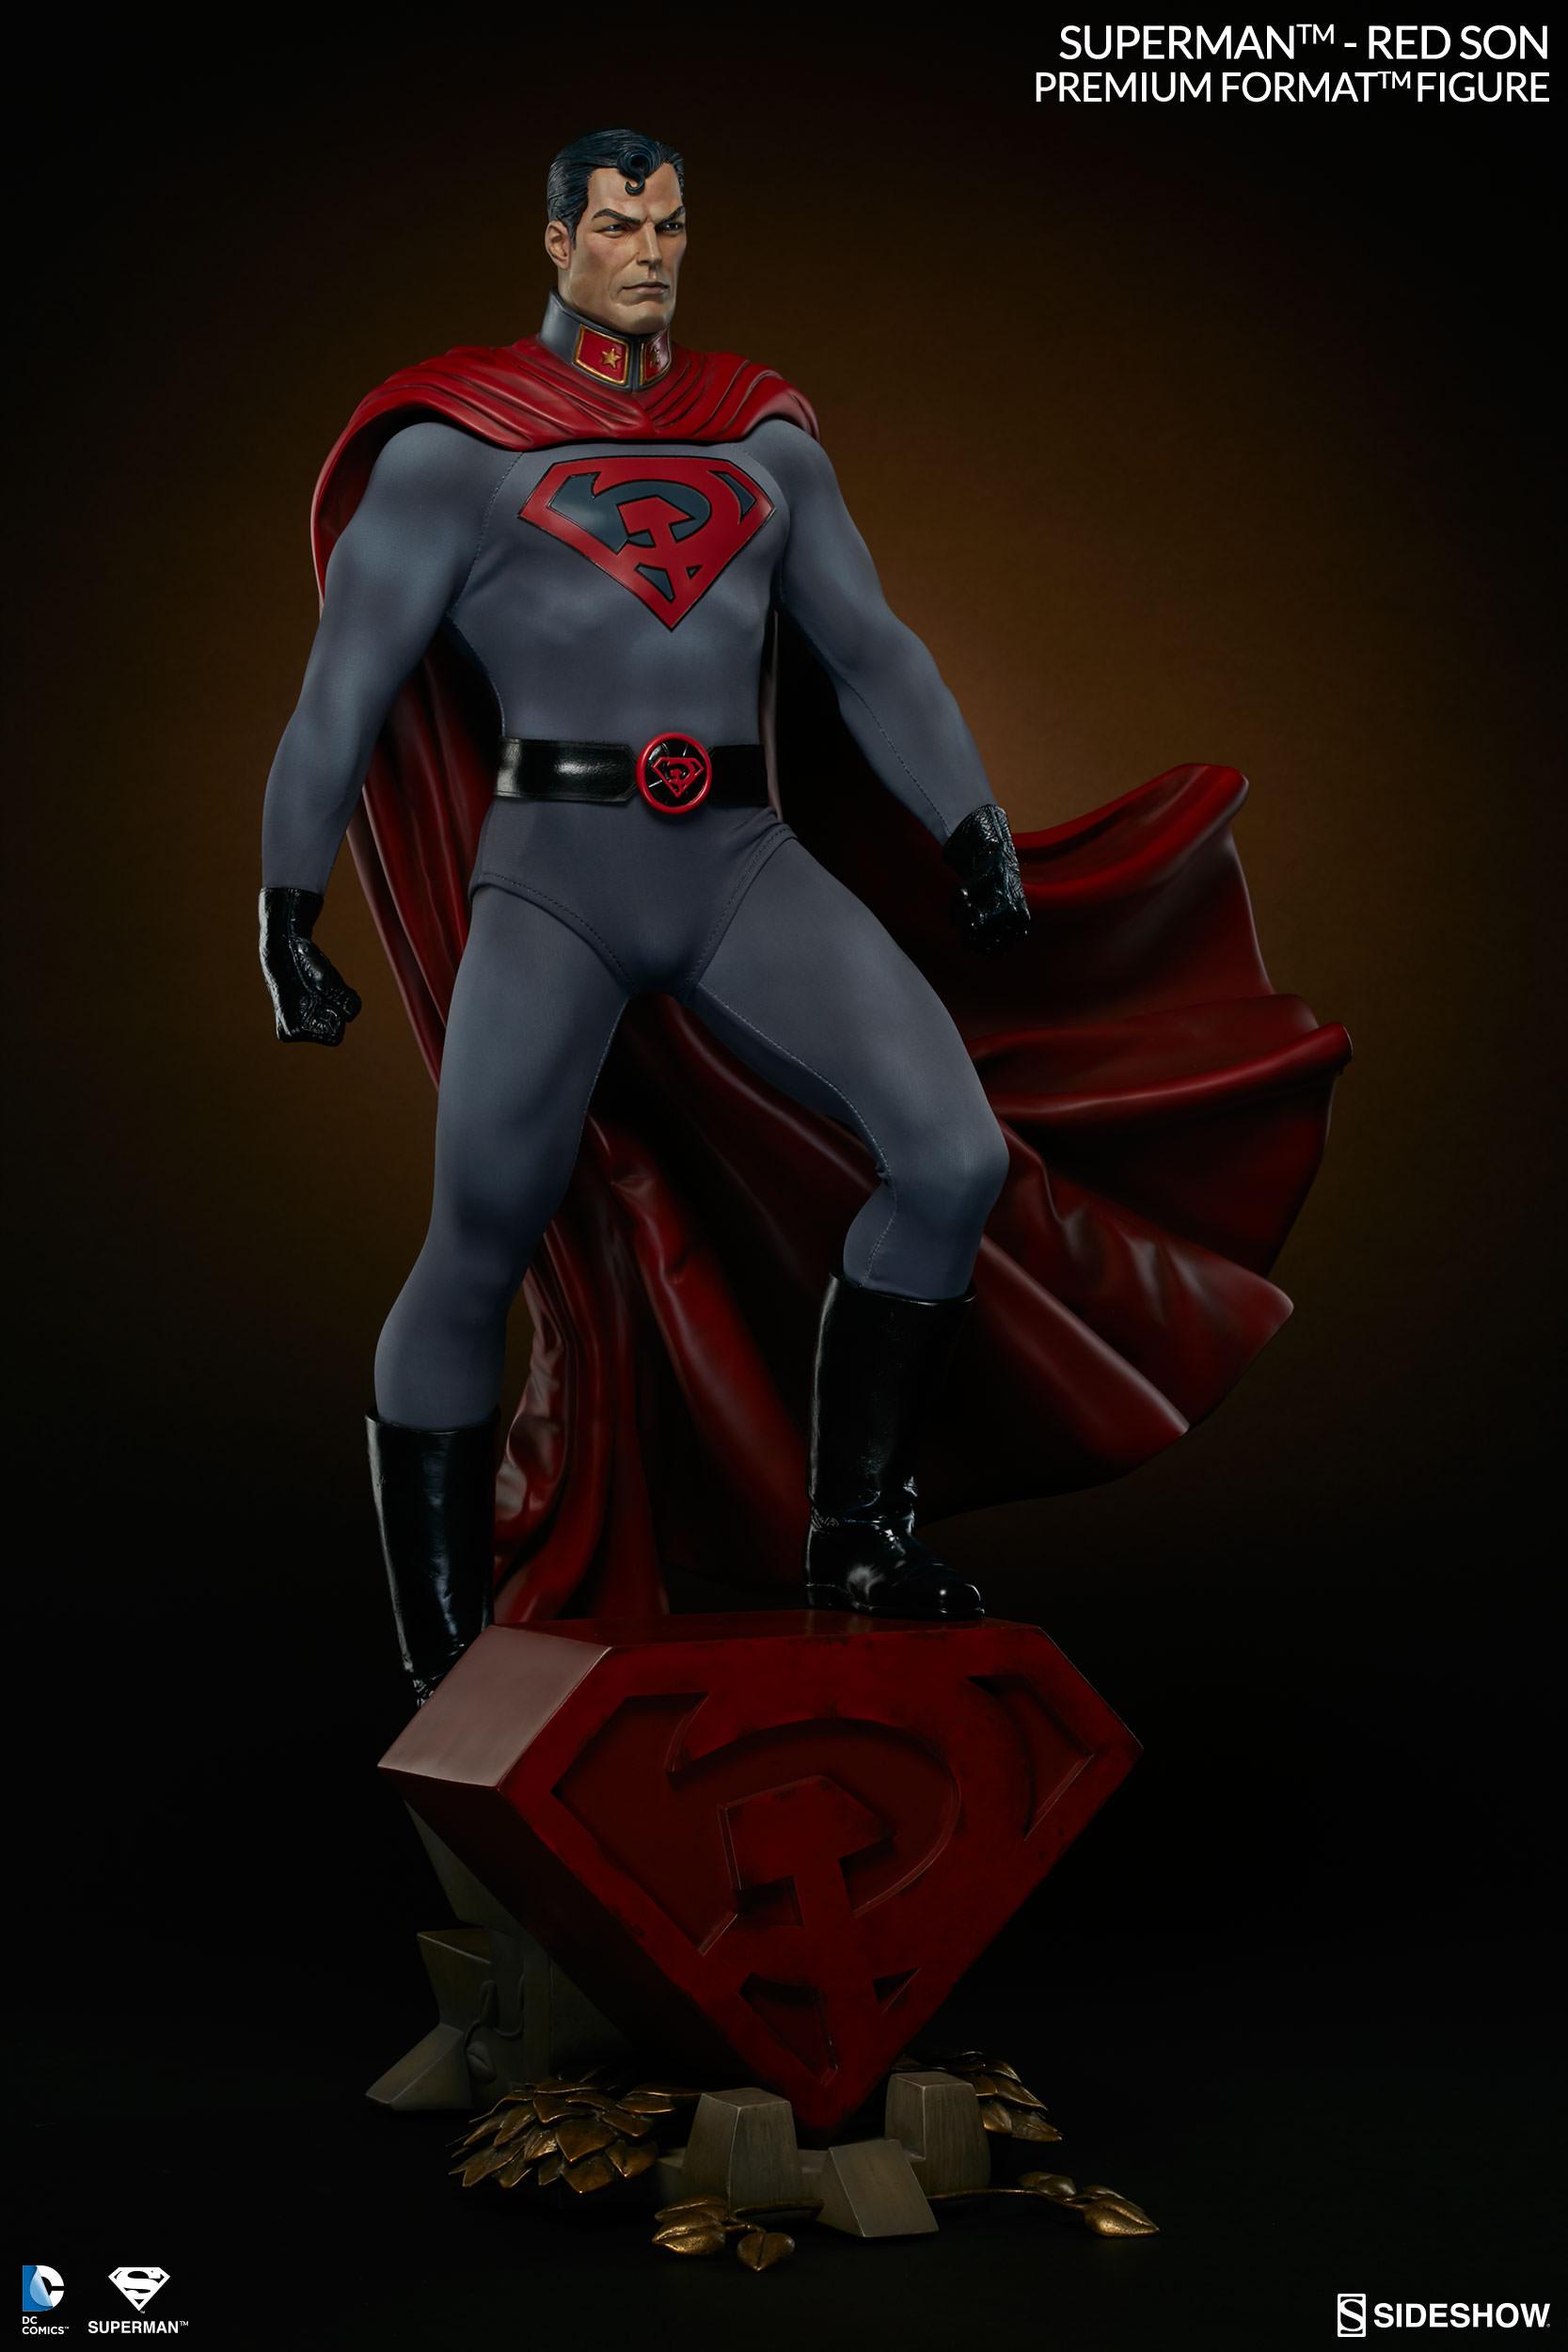 Sideshow Dc Comics Superman Red Son Premium Format Figure 1 4 Animetoys